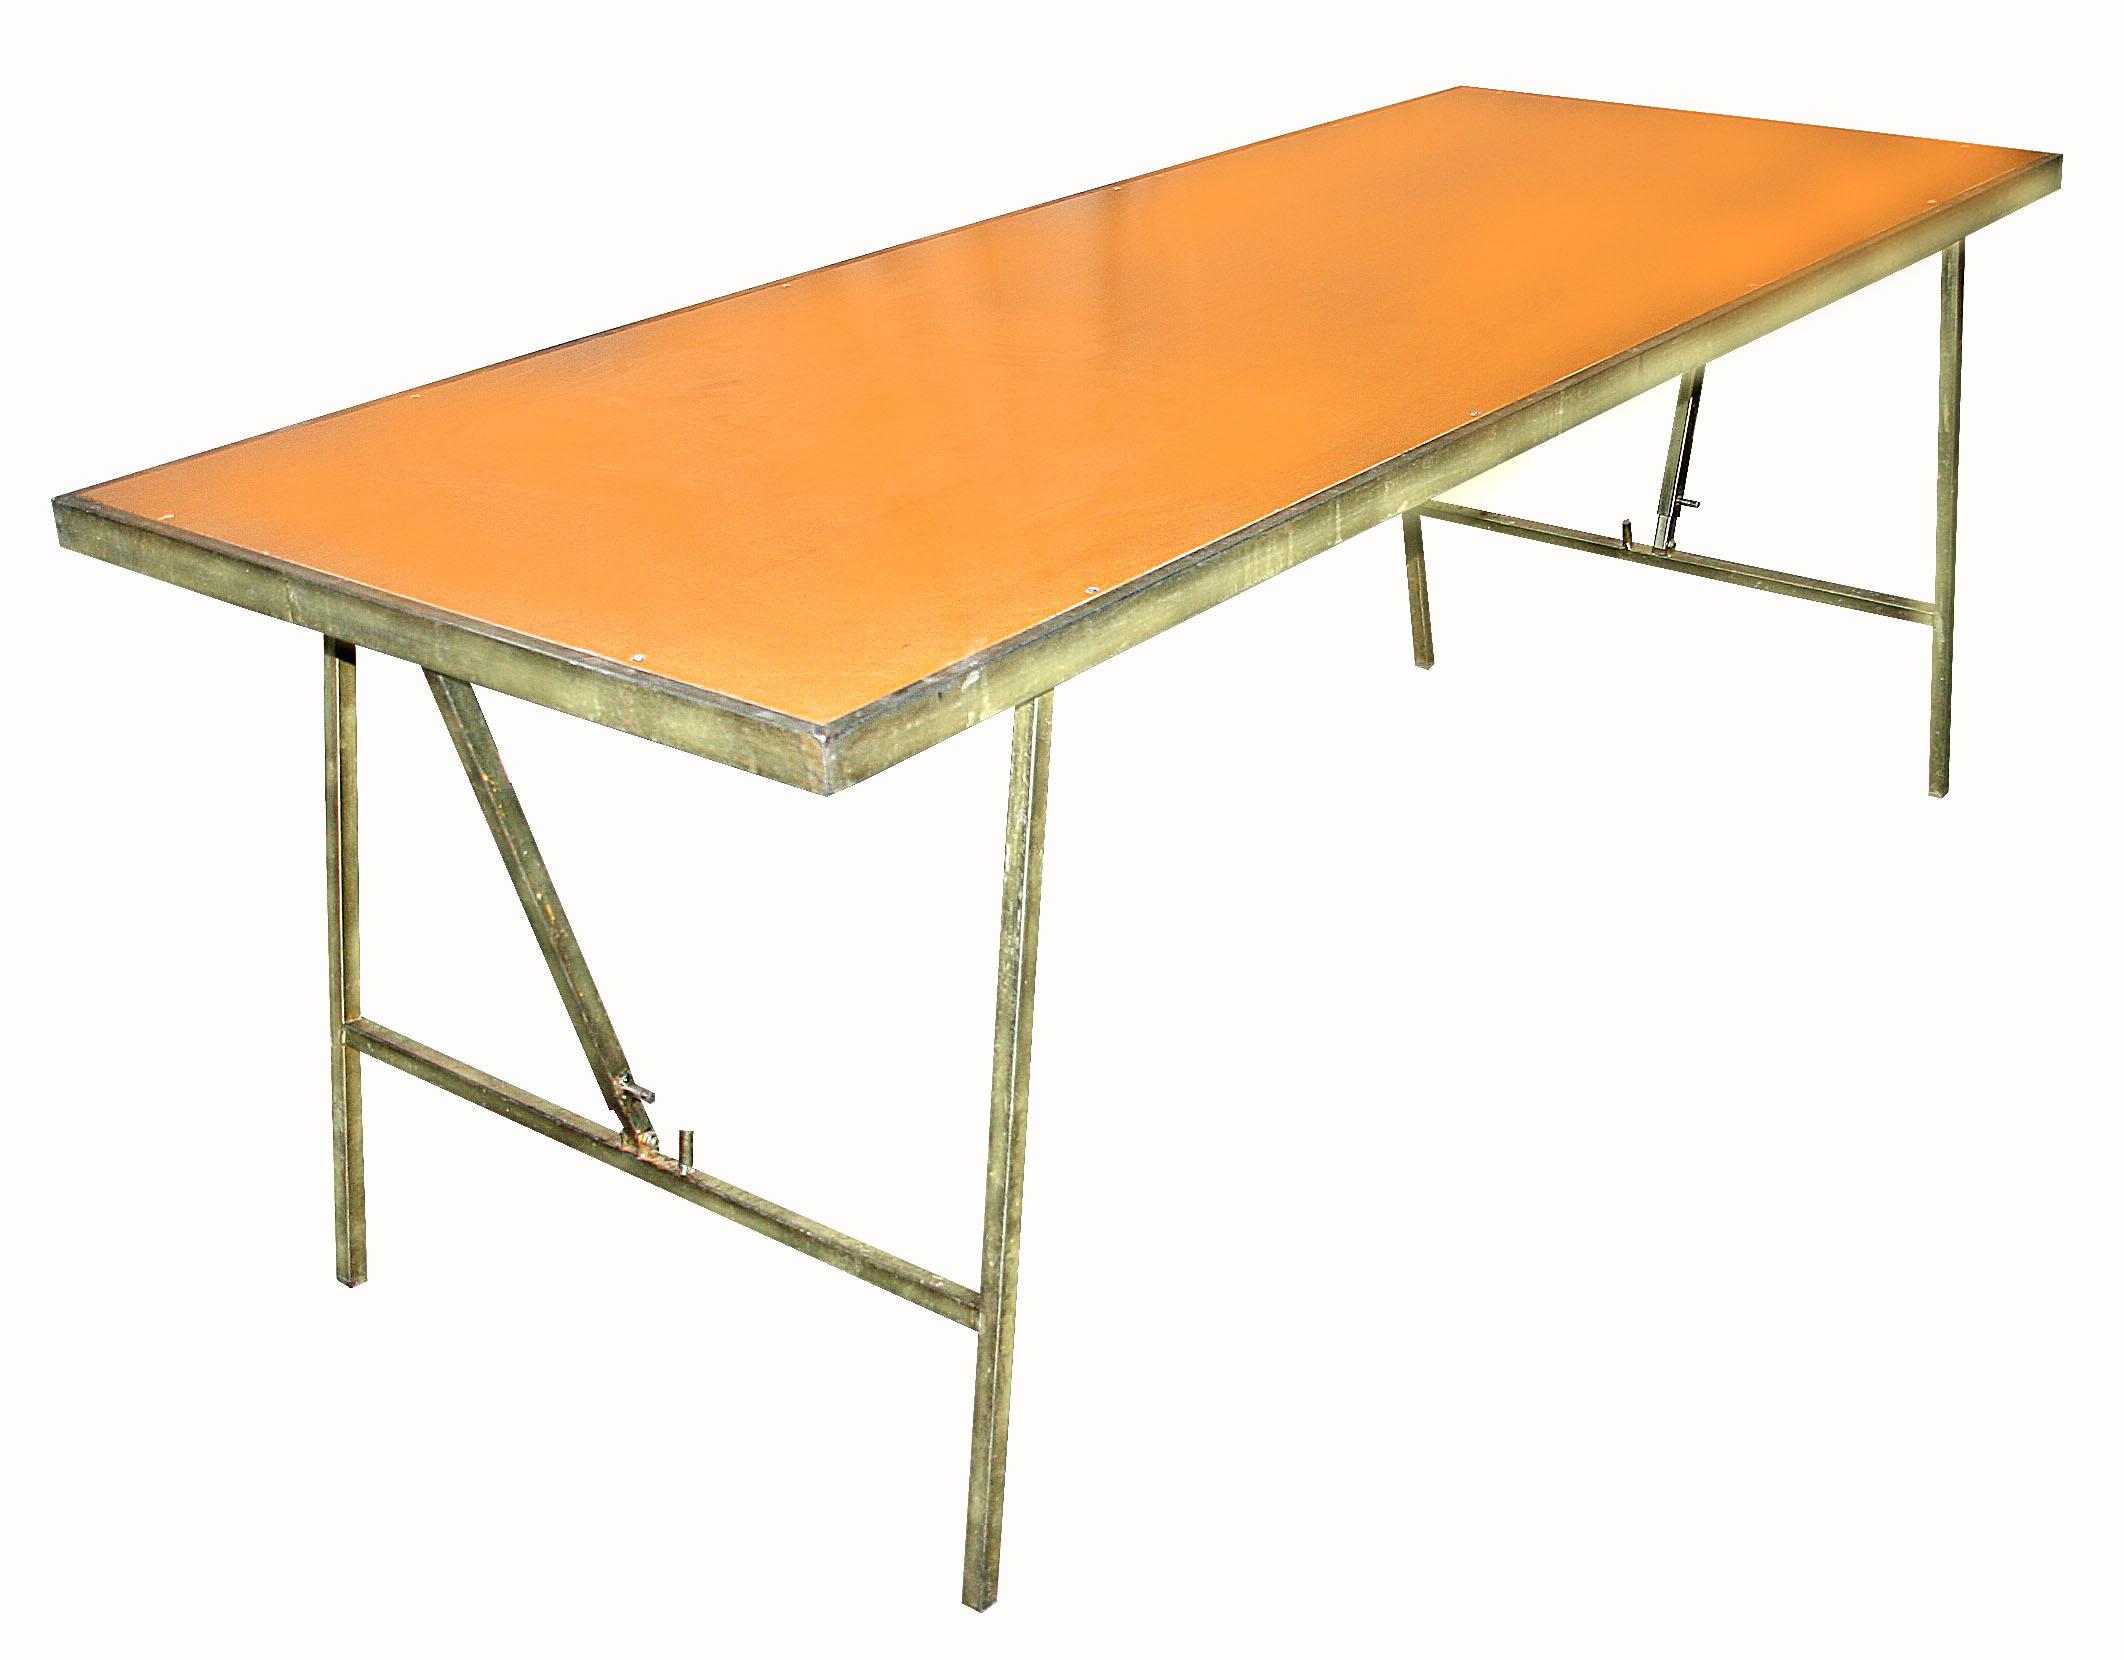 Alquiler de mesa sobre de madera patas de hierro - Mesa plegable madera ...